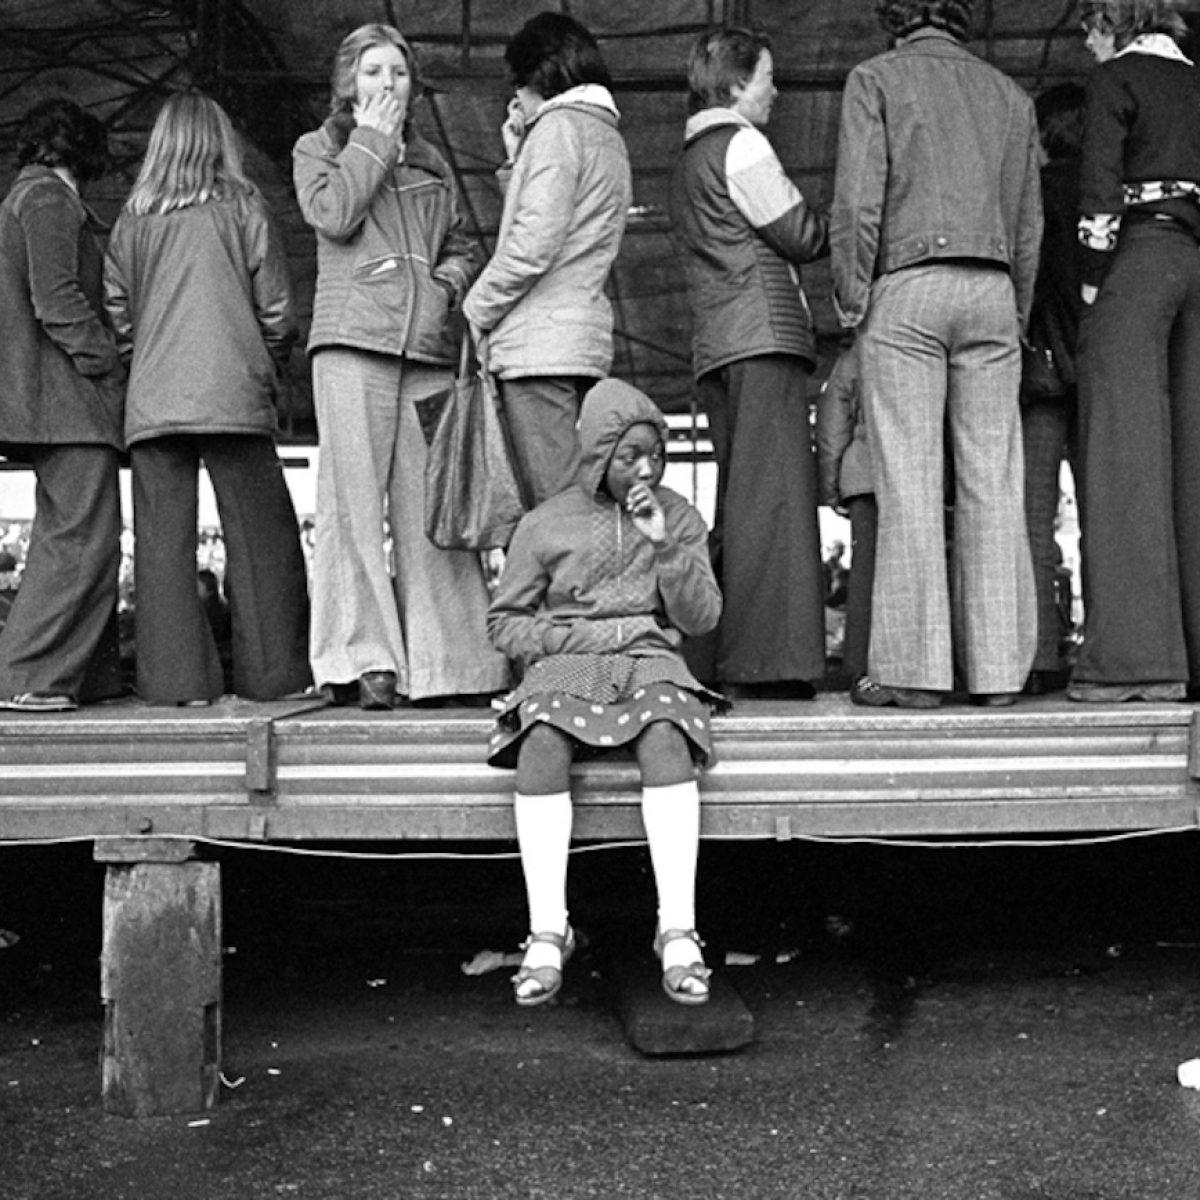 Bolton Fairground, 1970s.